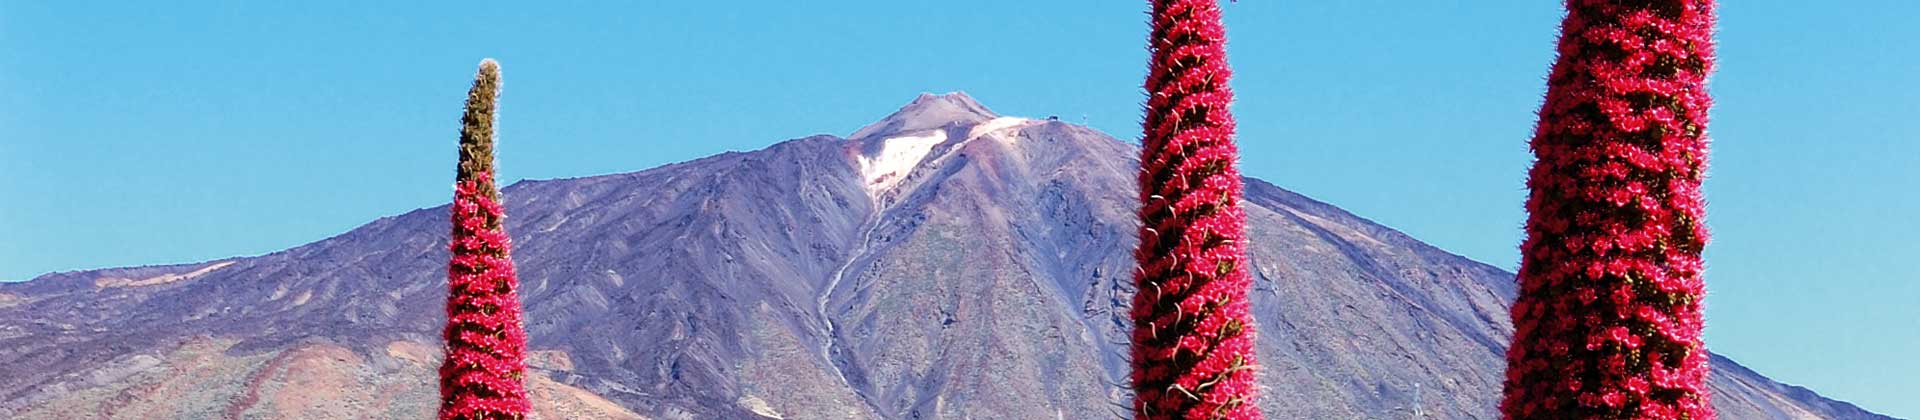 https://www.goodmorningtenerife.com/wp-content/uploads/2014/08/03_slide_teide_GM_Tenerife.jpg